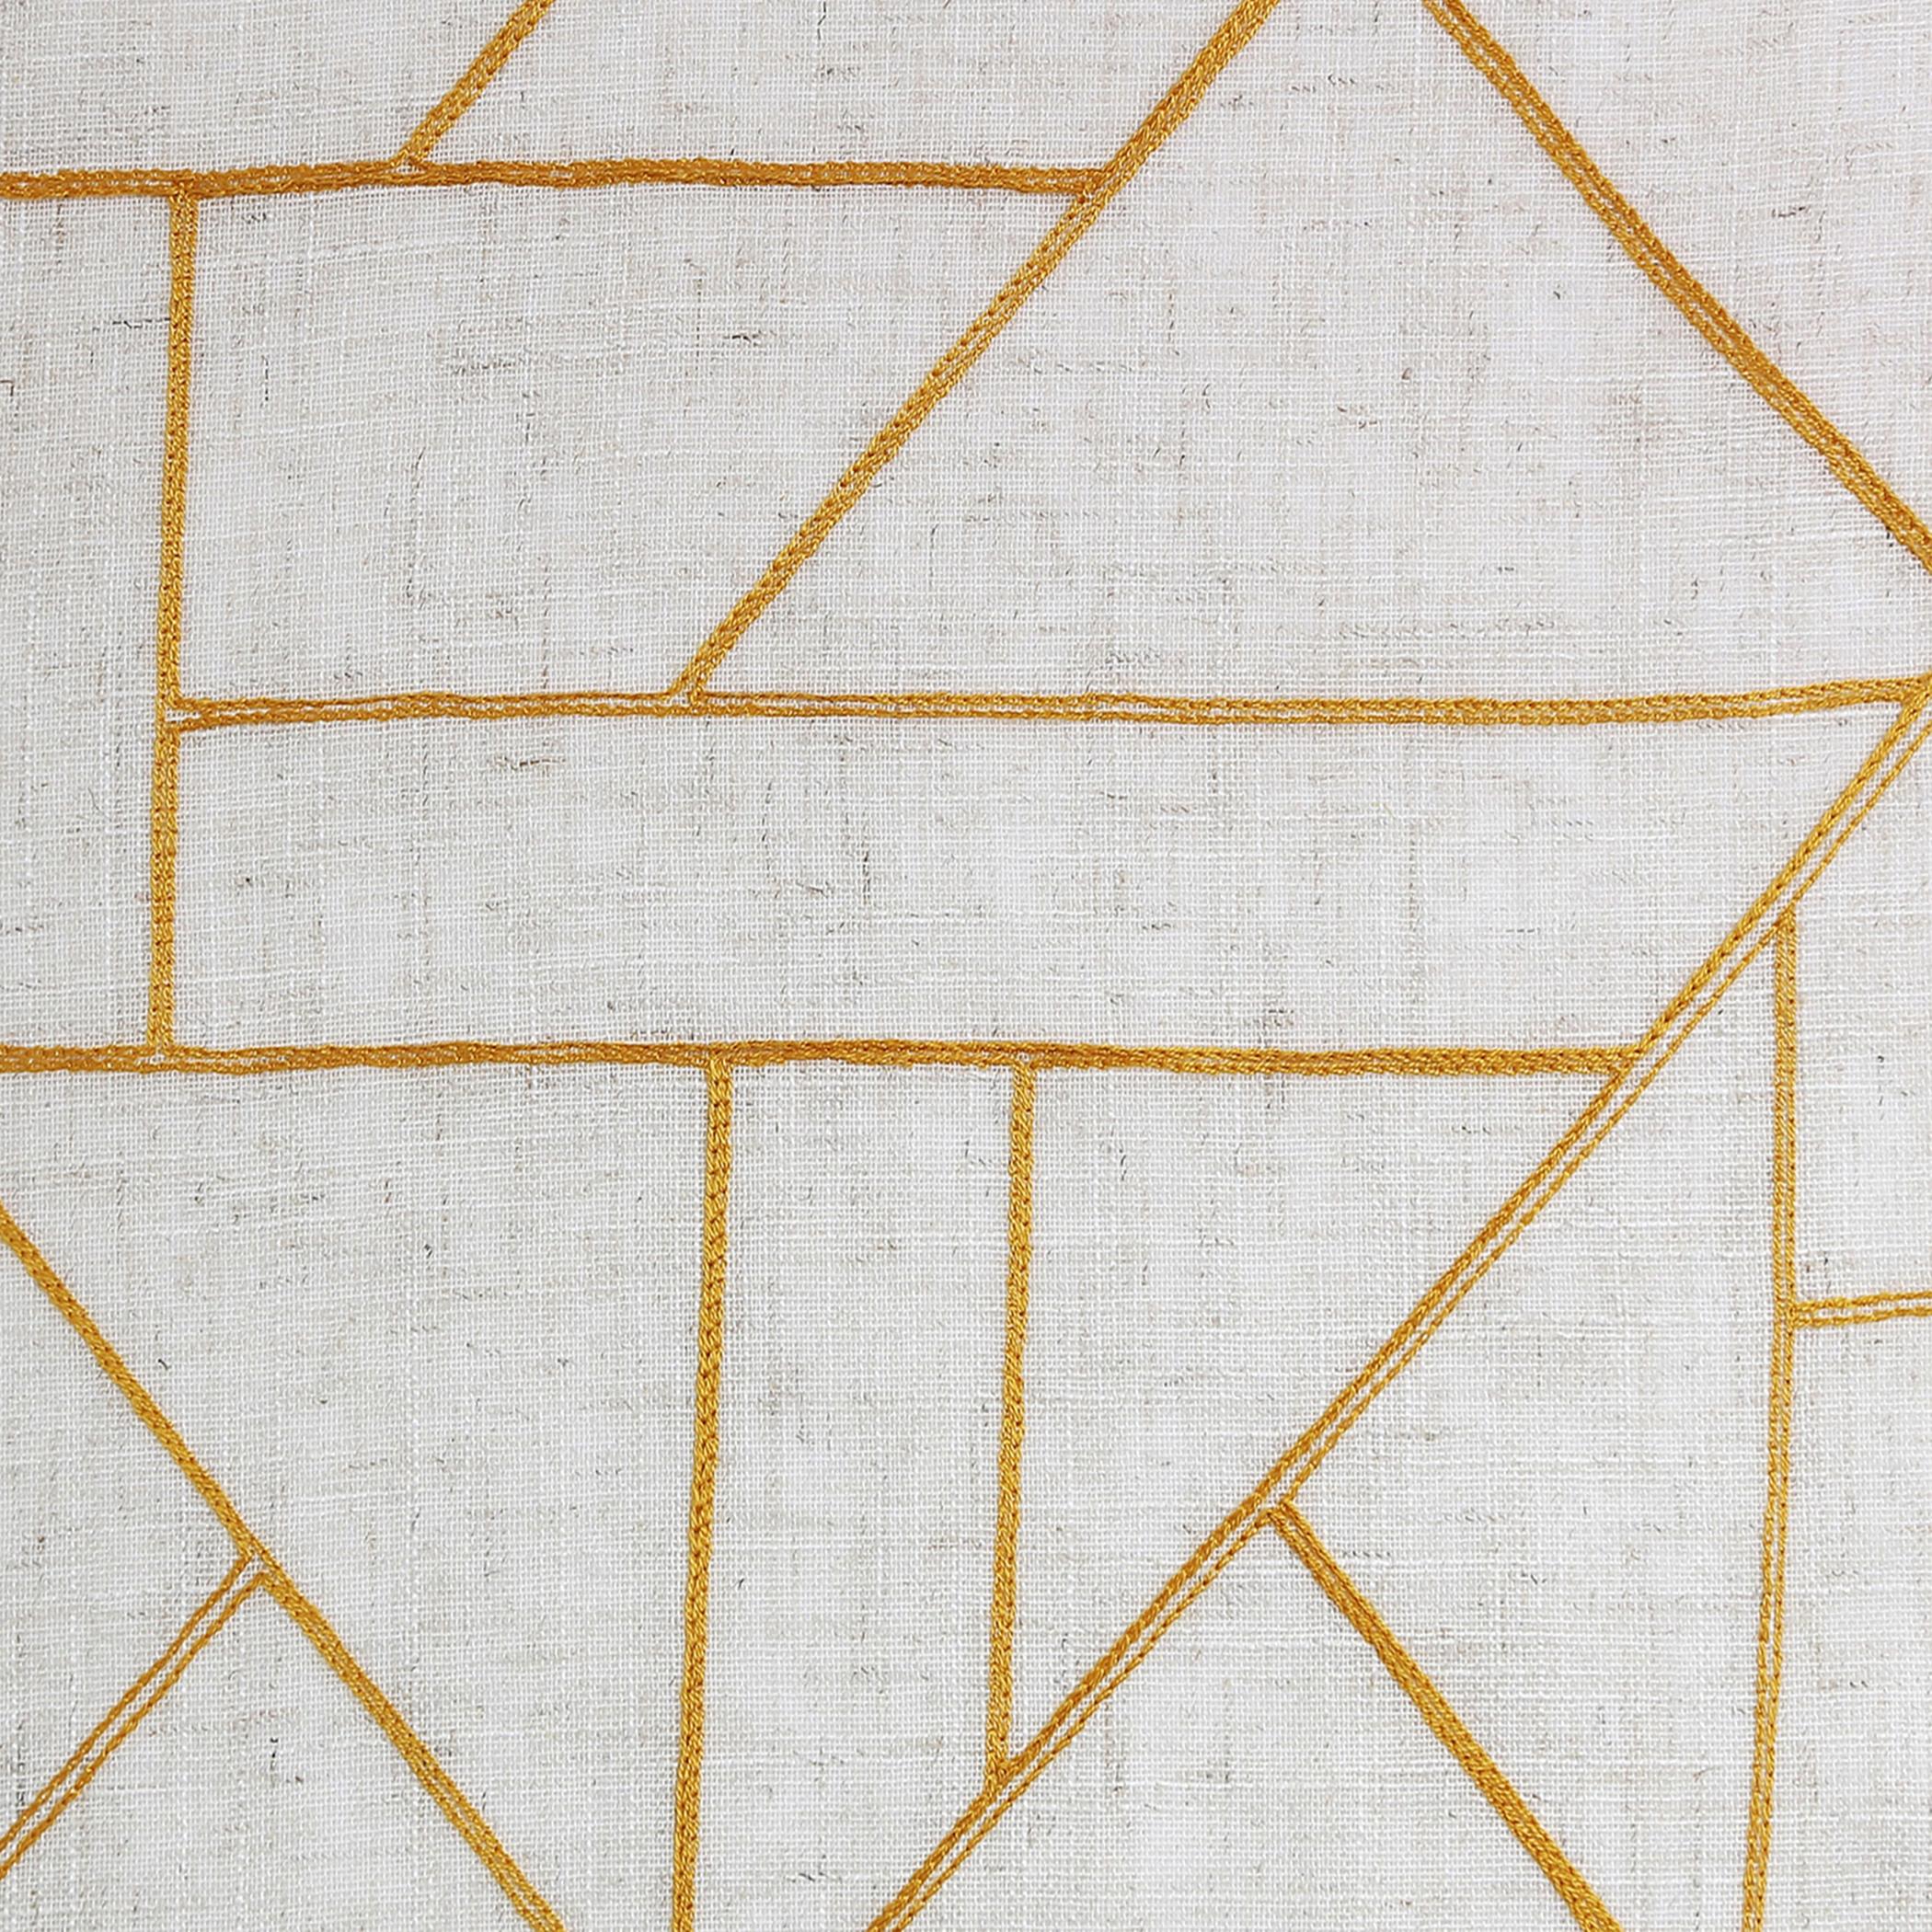 Archaeo Jigsaw Embroidery Linen Blend Curtain – Walmart With Regard To Archaeo Jigsaw Embroidery Linen Blend Curtain Panels (Image 6 of 20)